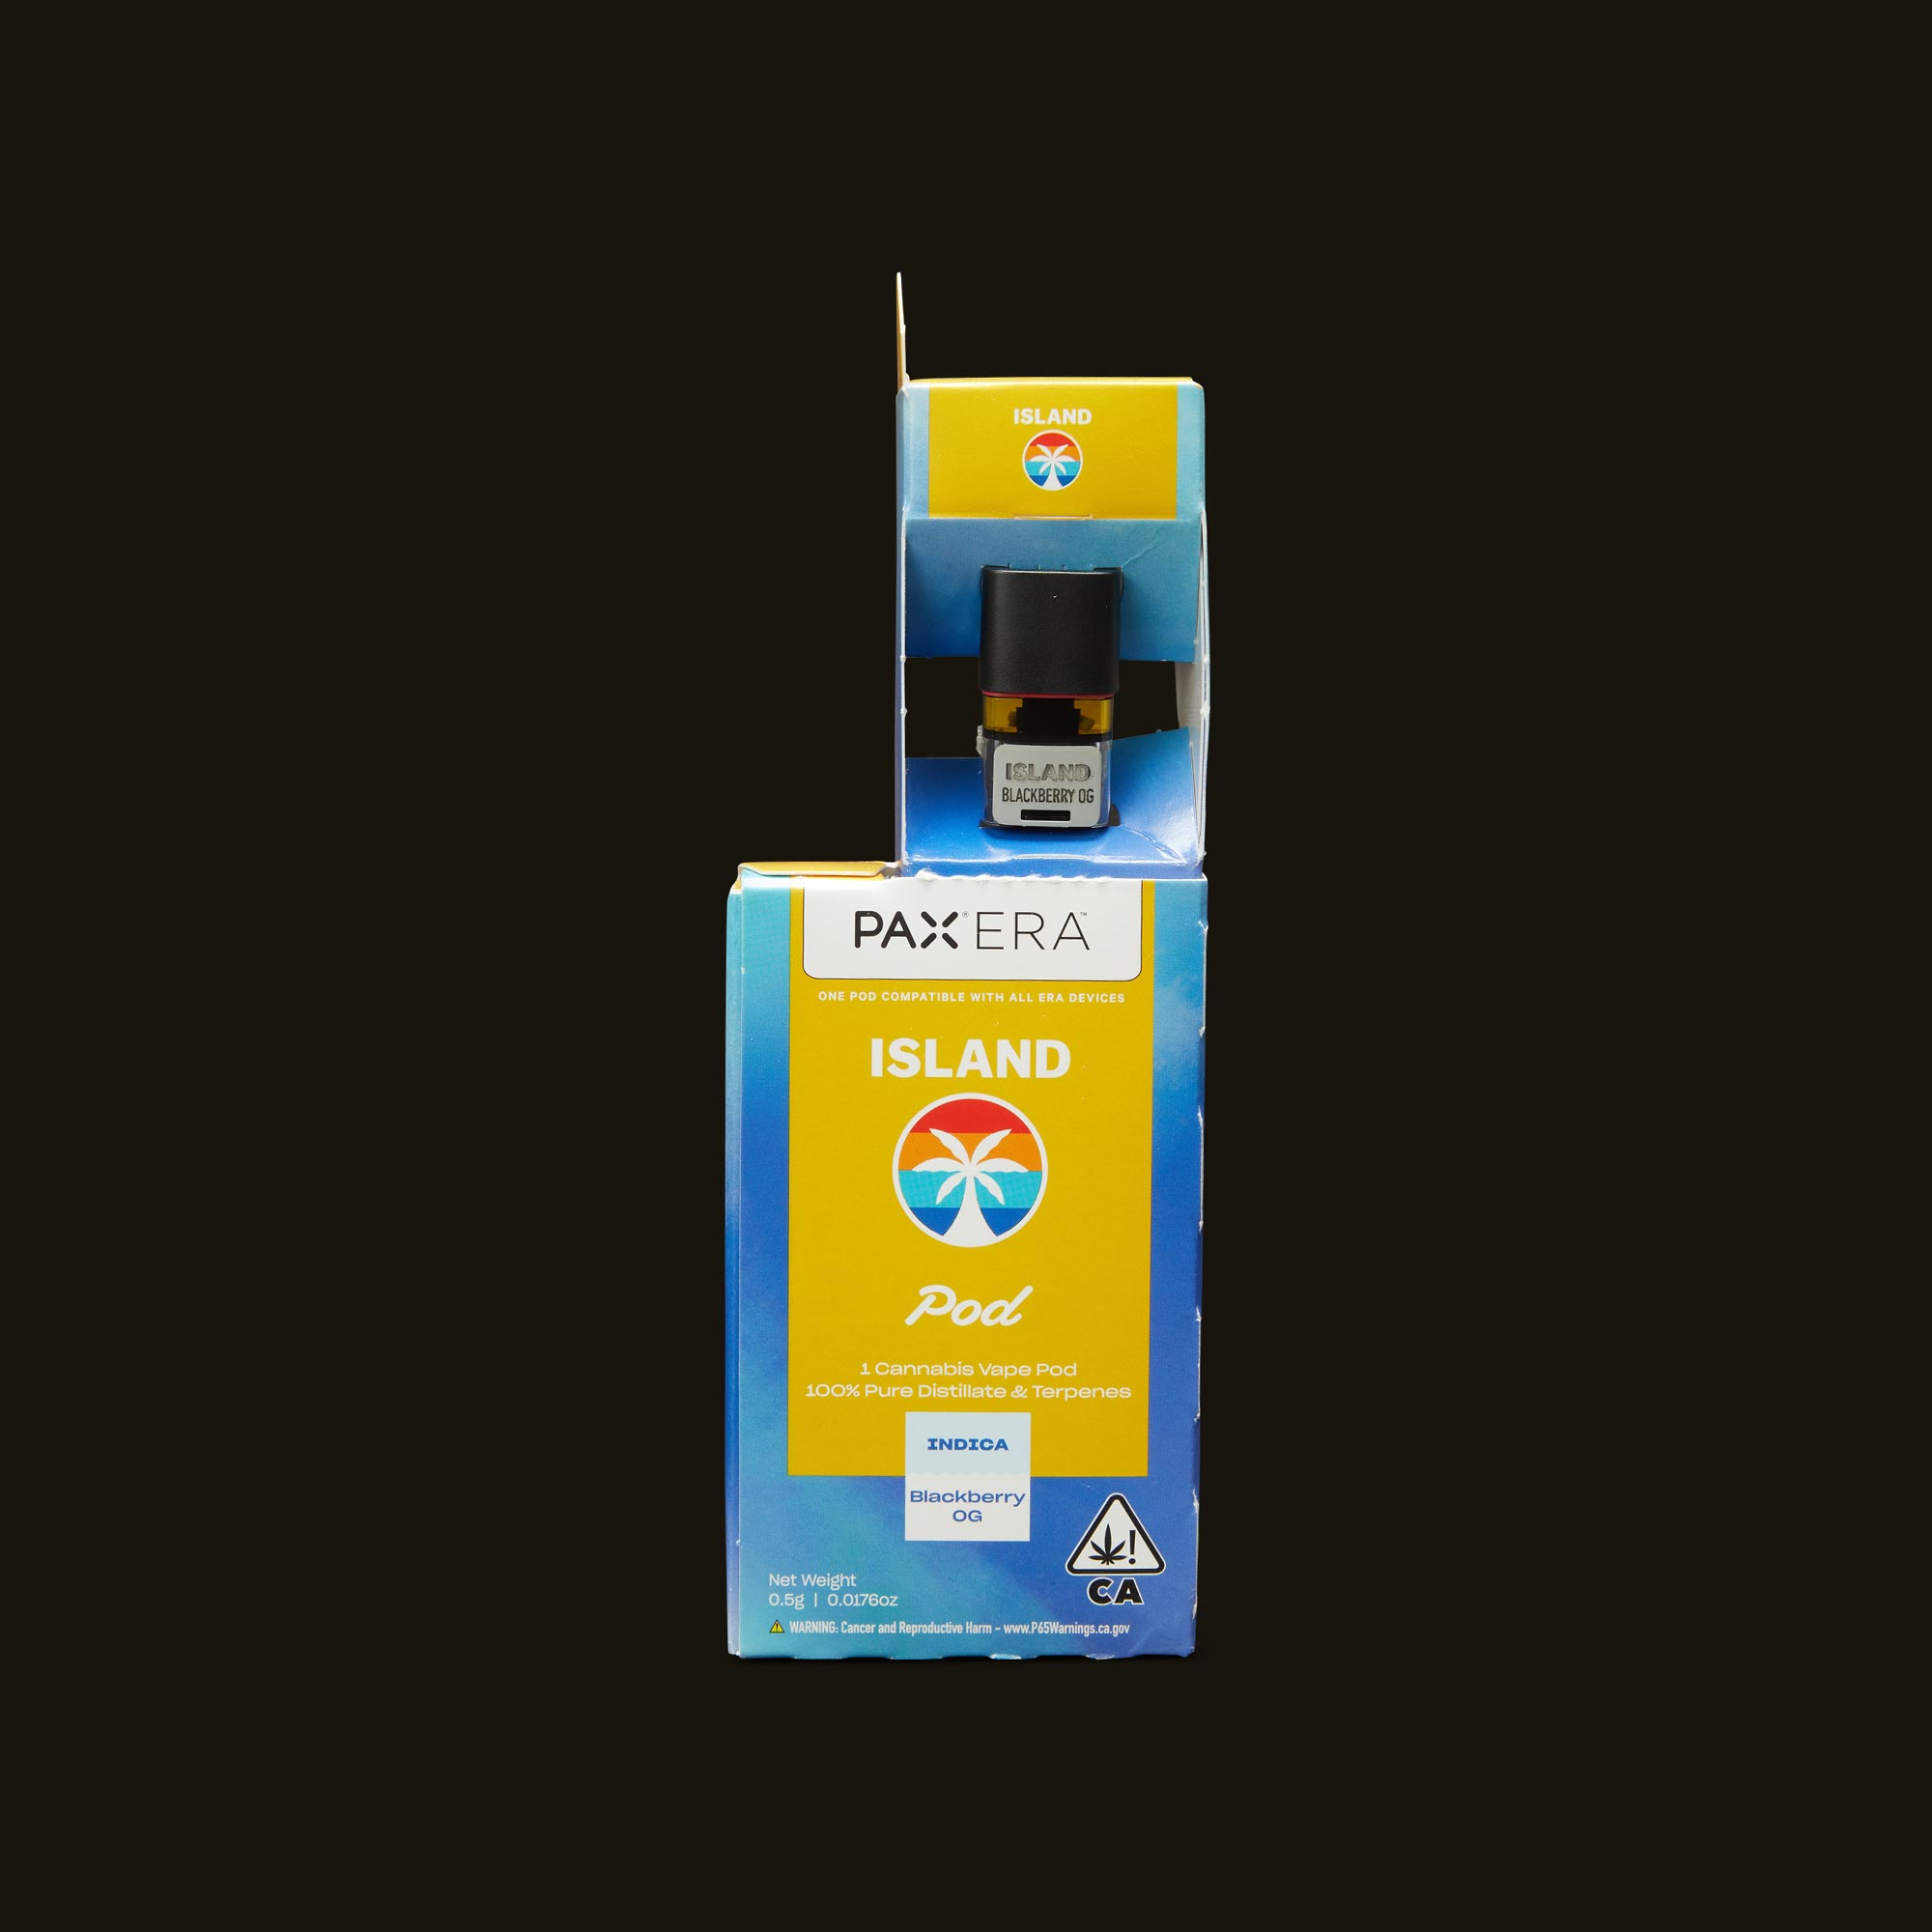 Island Blackberry OG PAX Era Pod Open Packaging